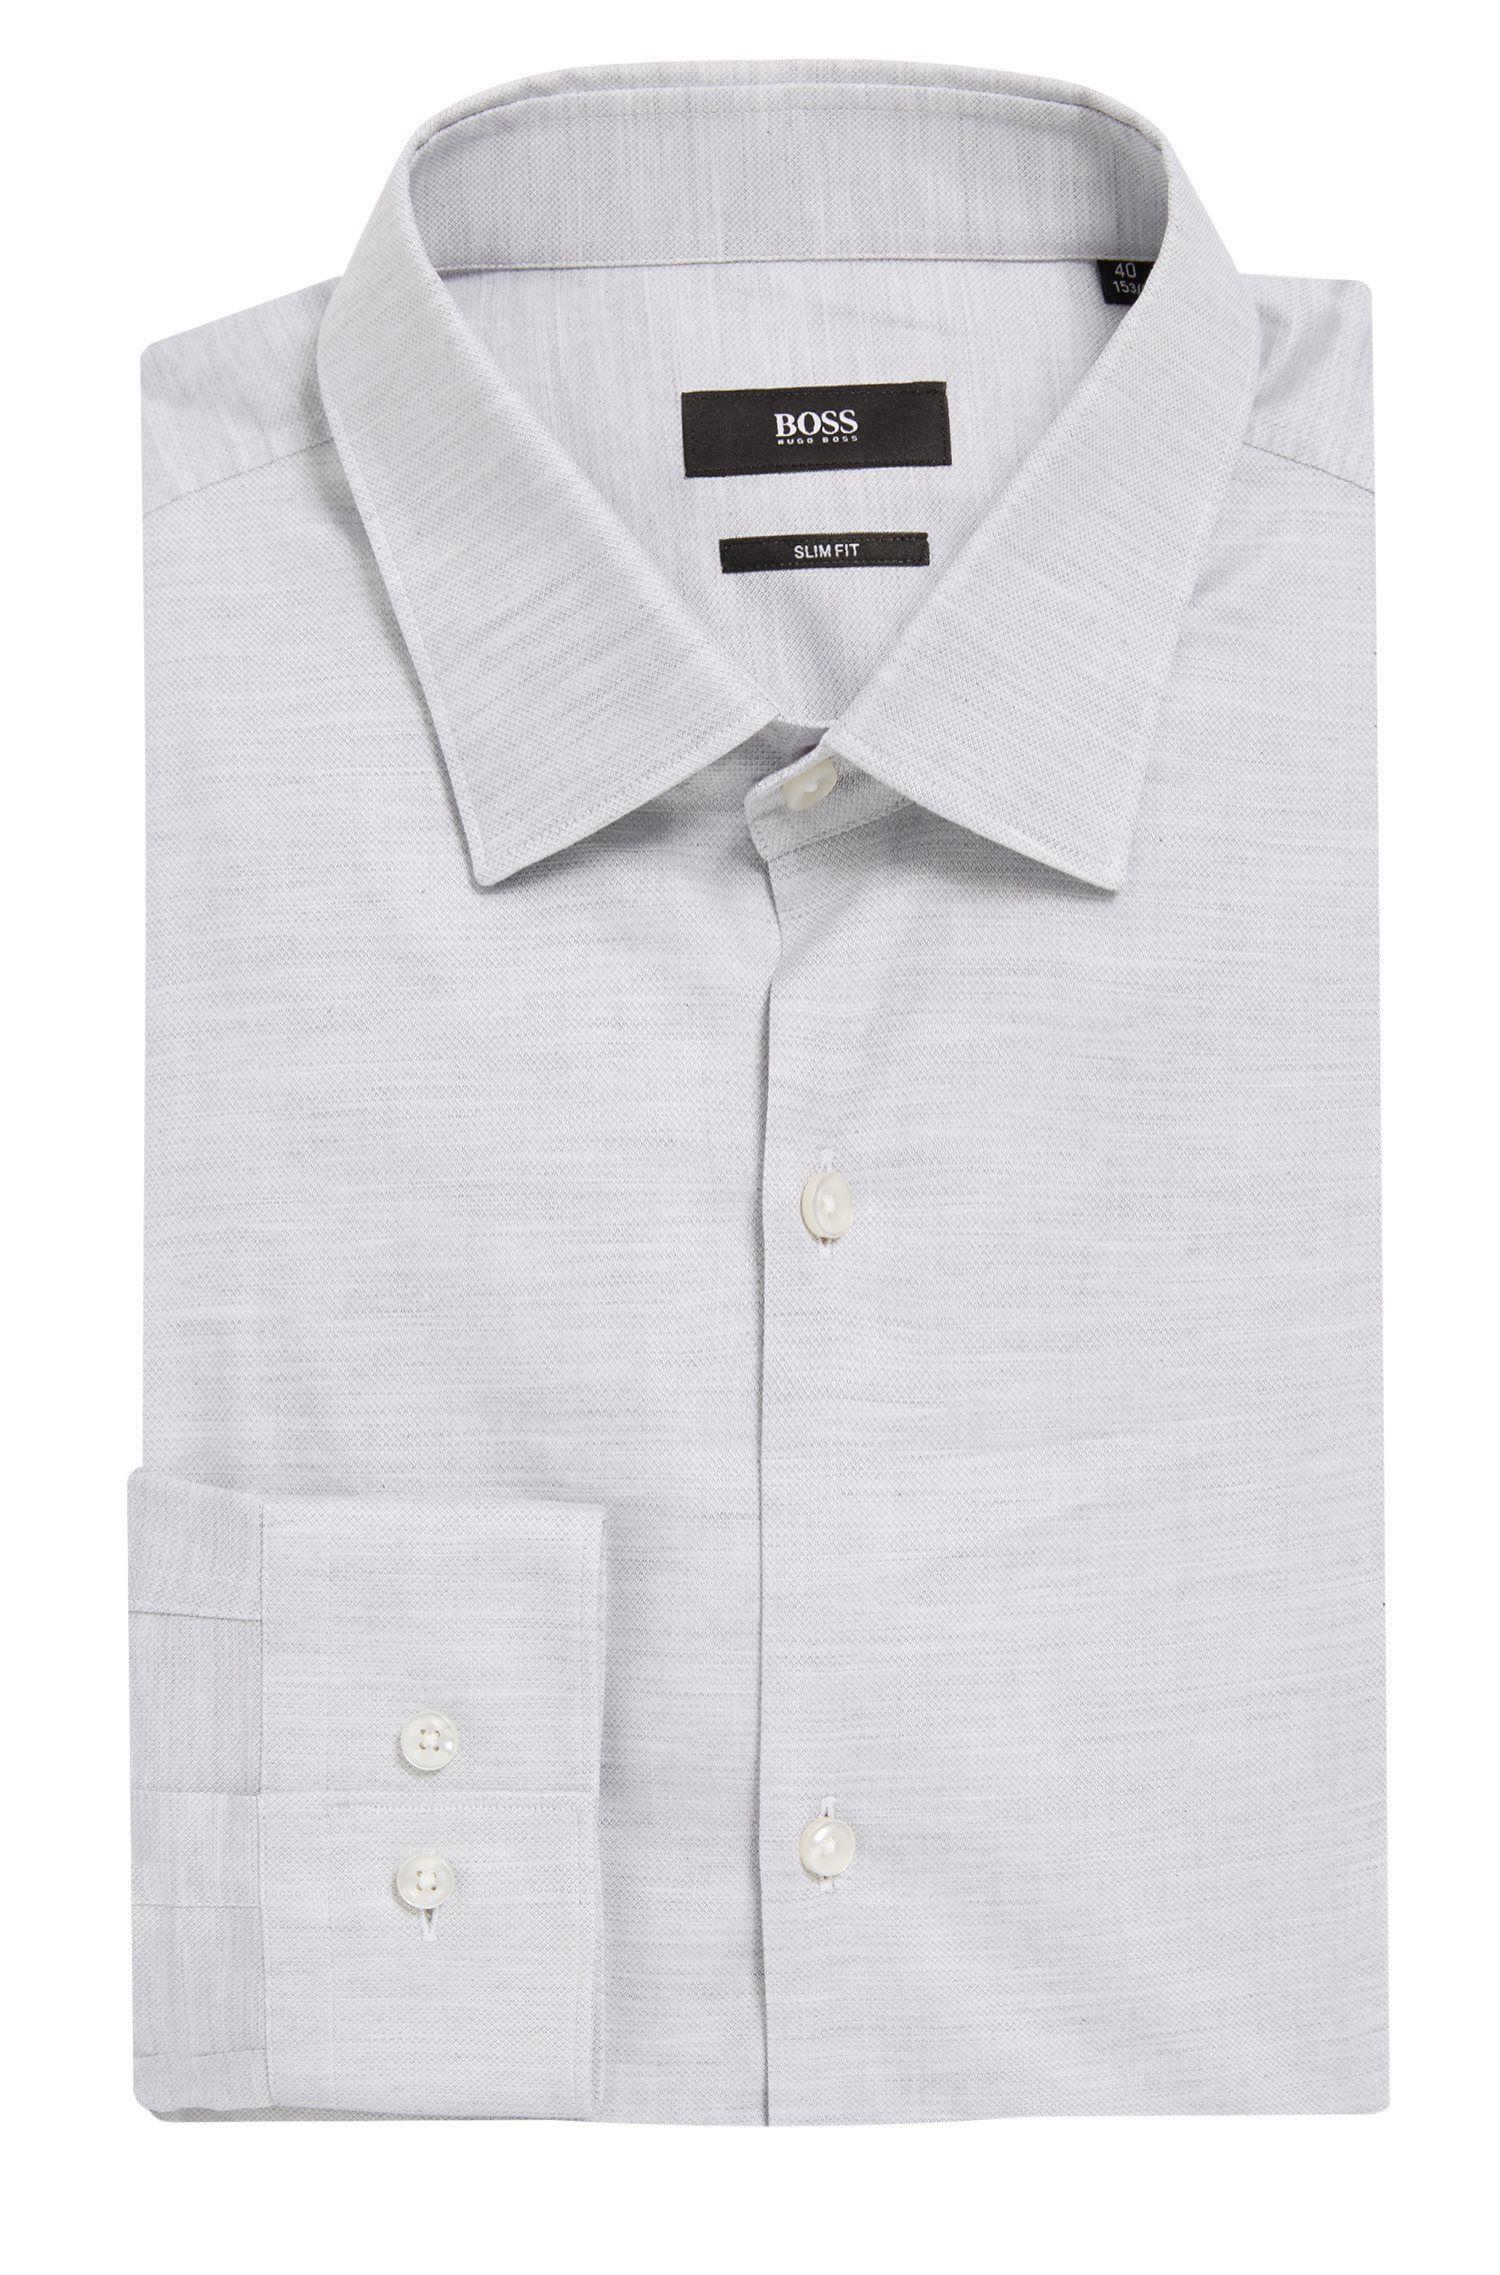 Yarn-Dyed Cotton Oxford Dress Shirt, Slim Fit | Ismo, Light Grey